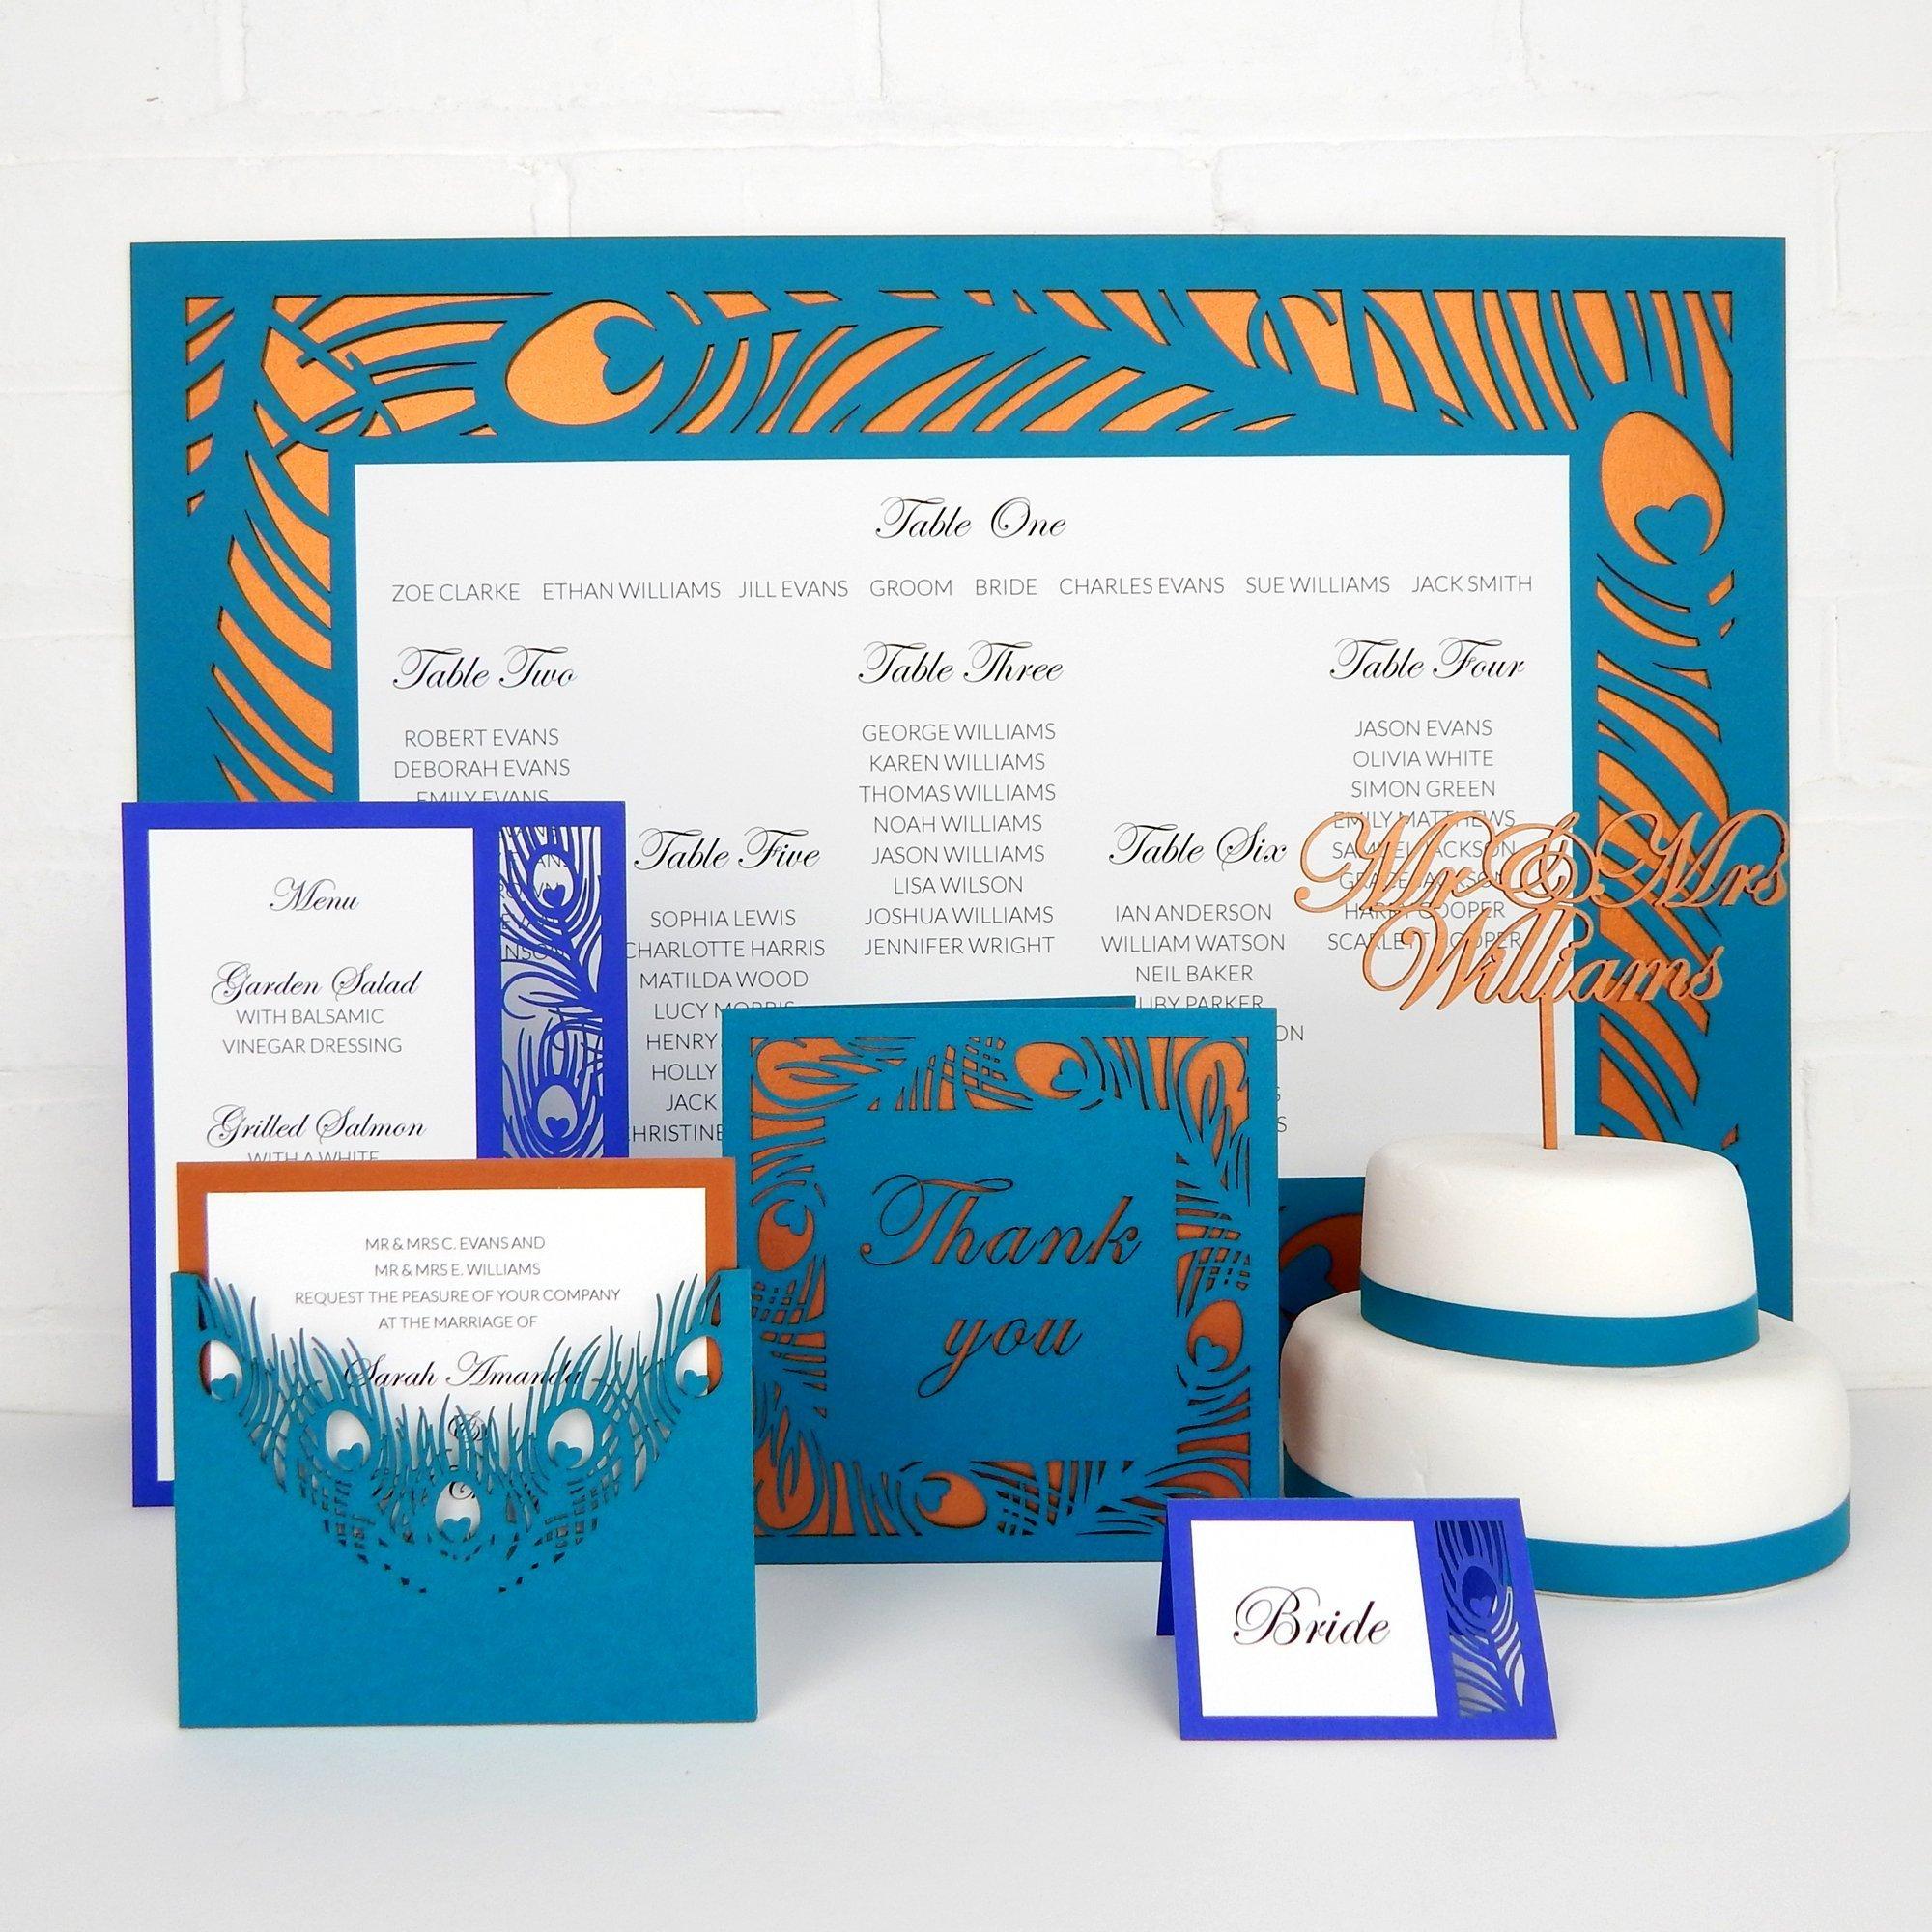 La Plume wedding stationery collection